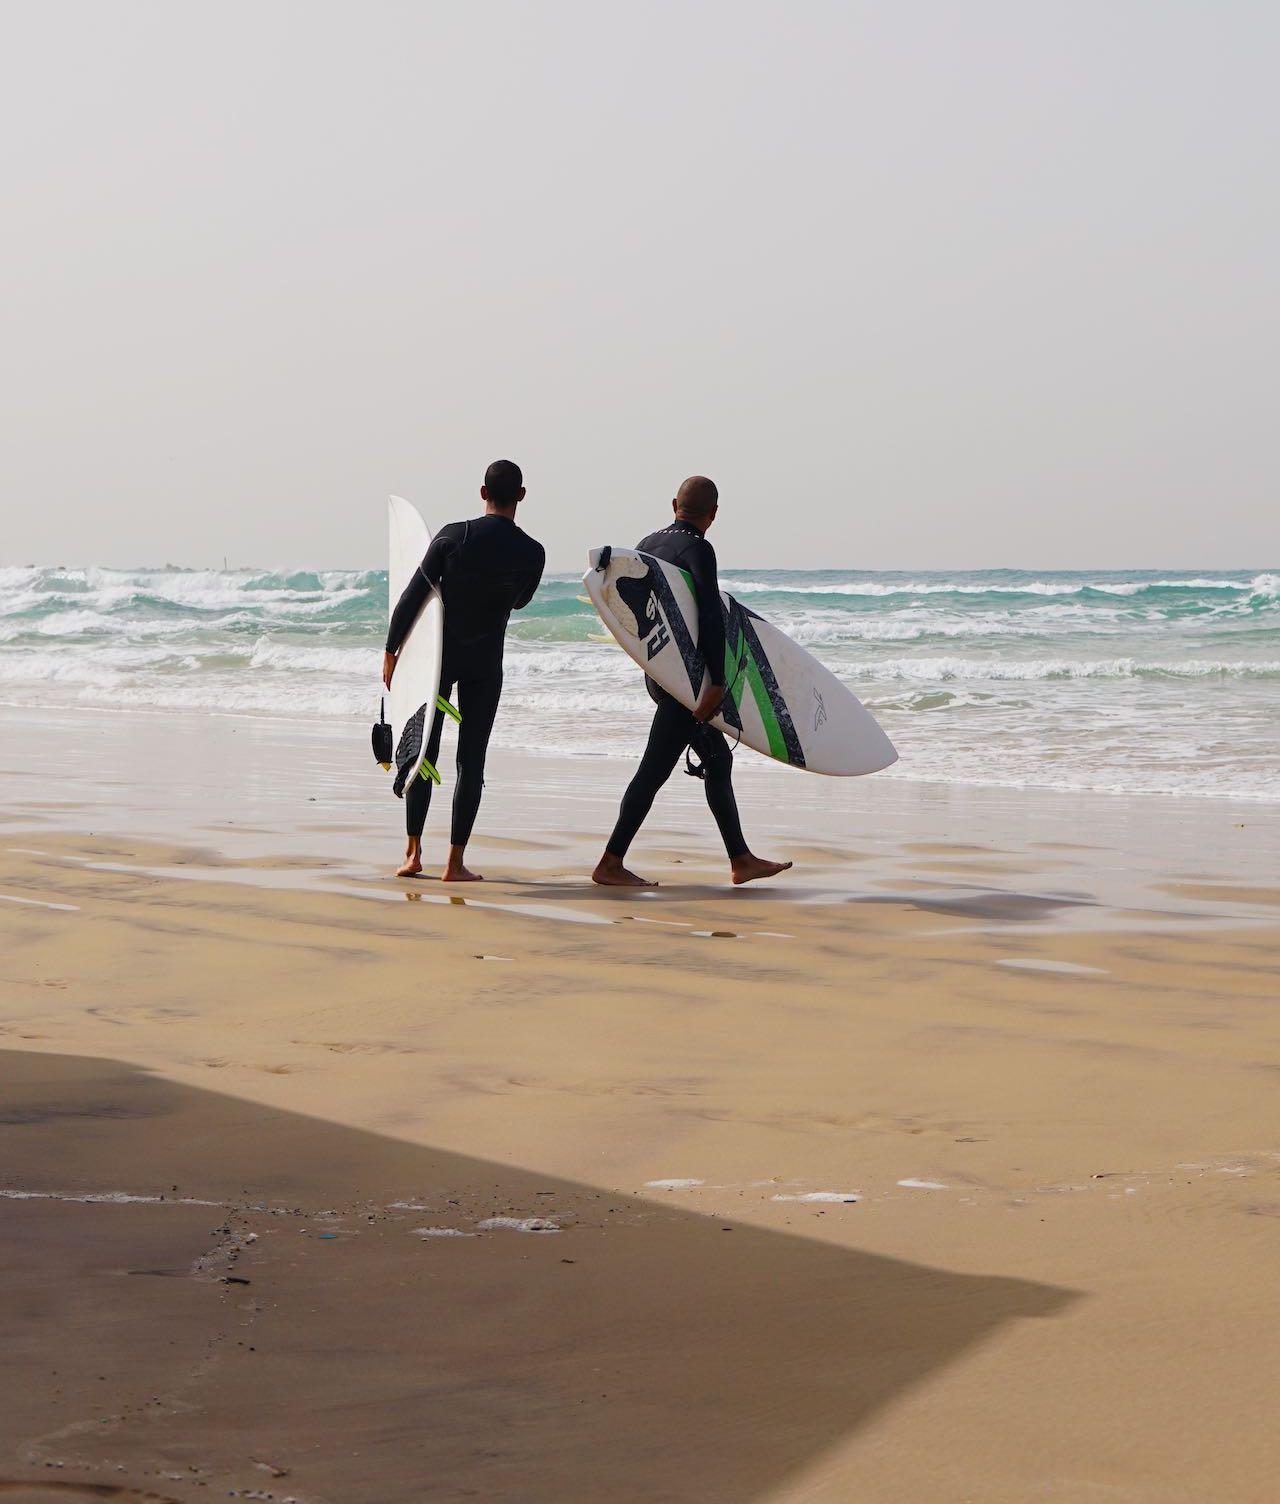 Surf in Tel Aviv beach